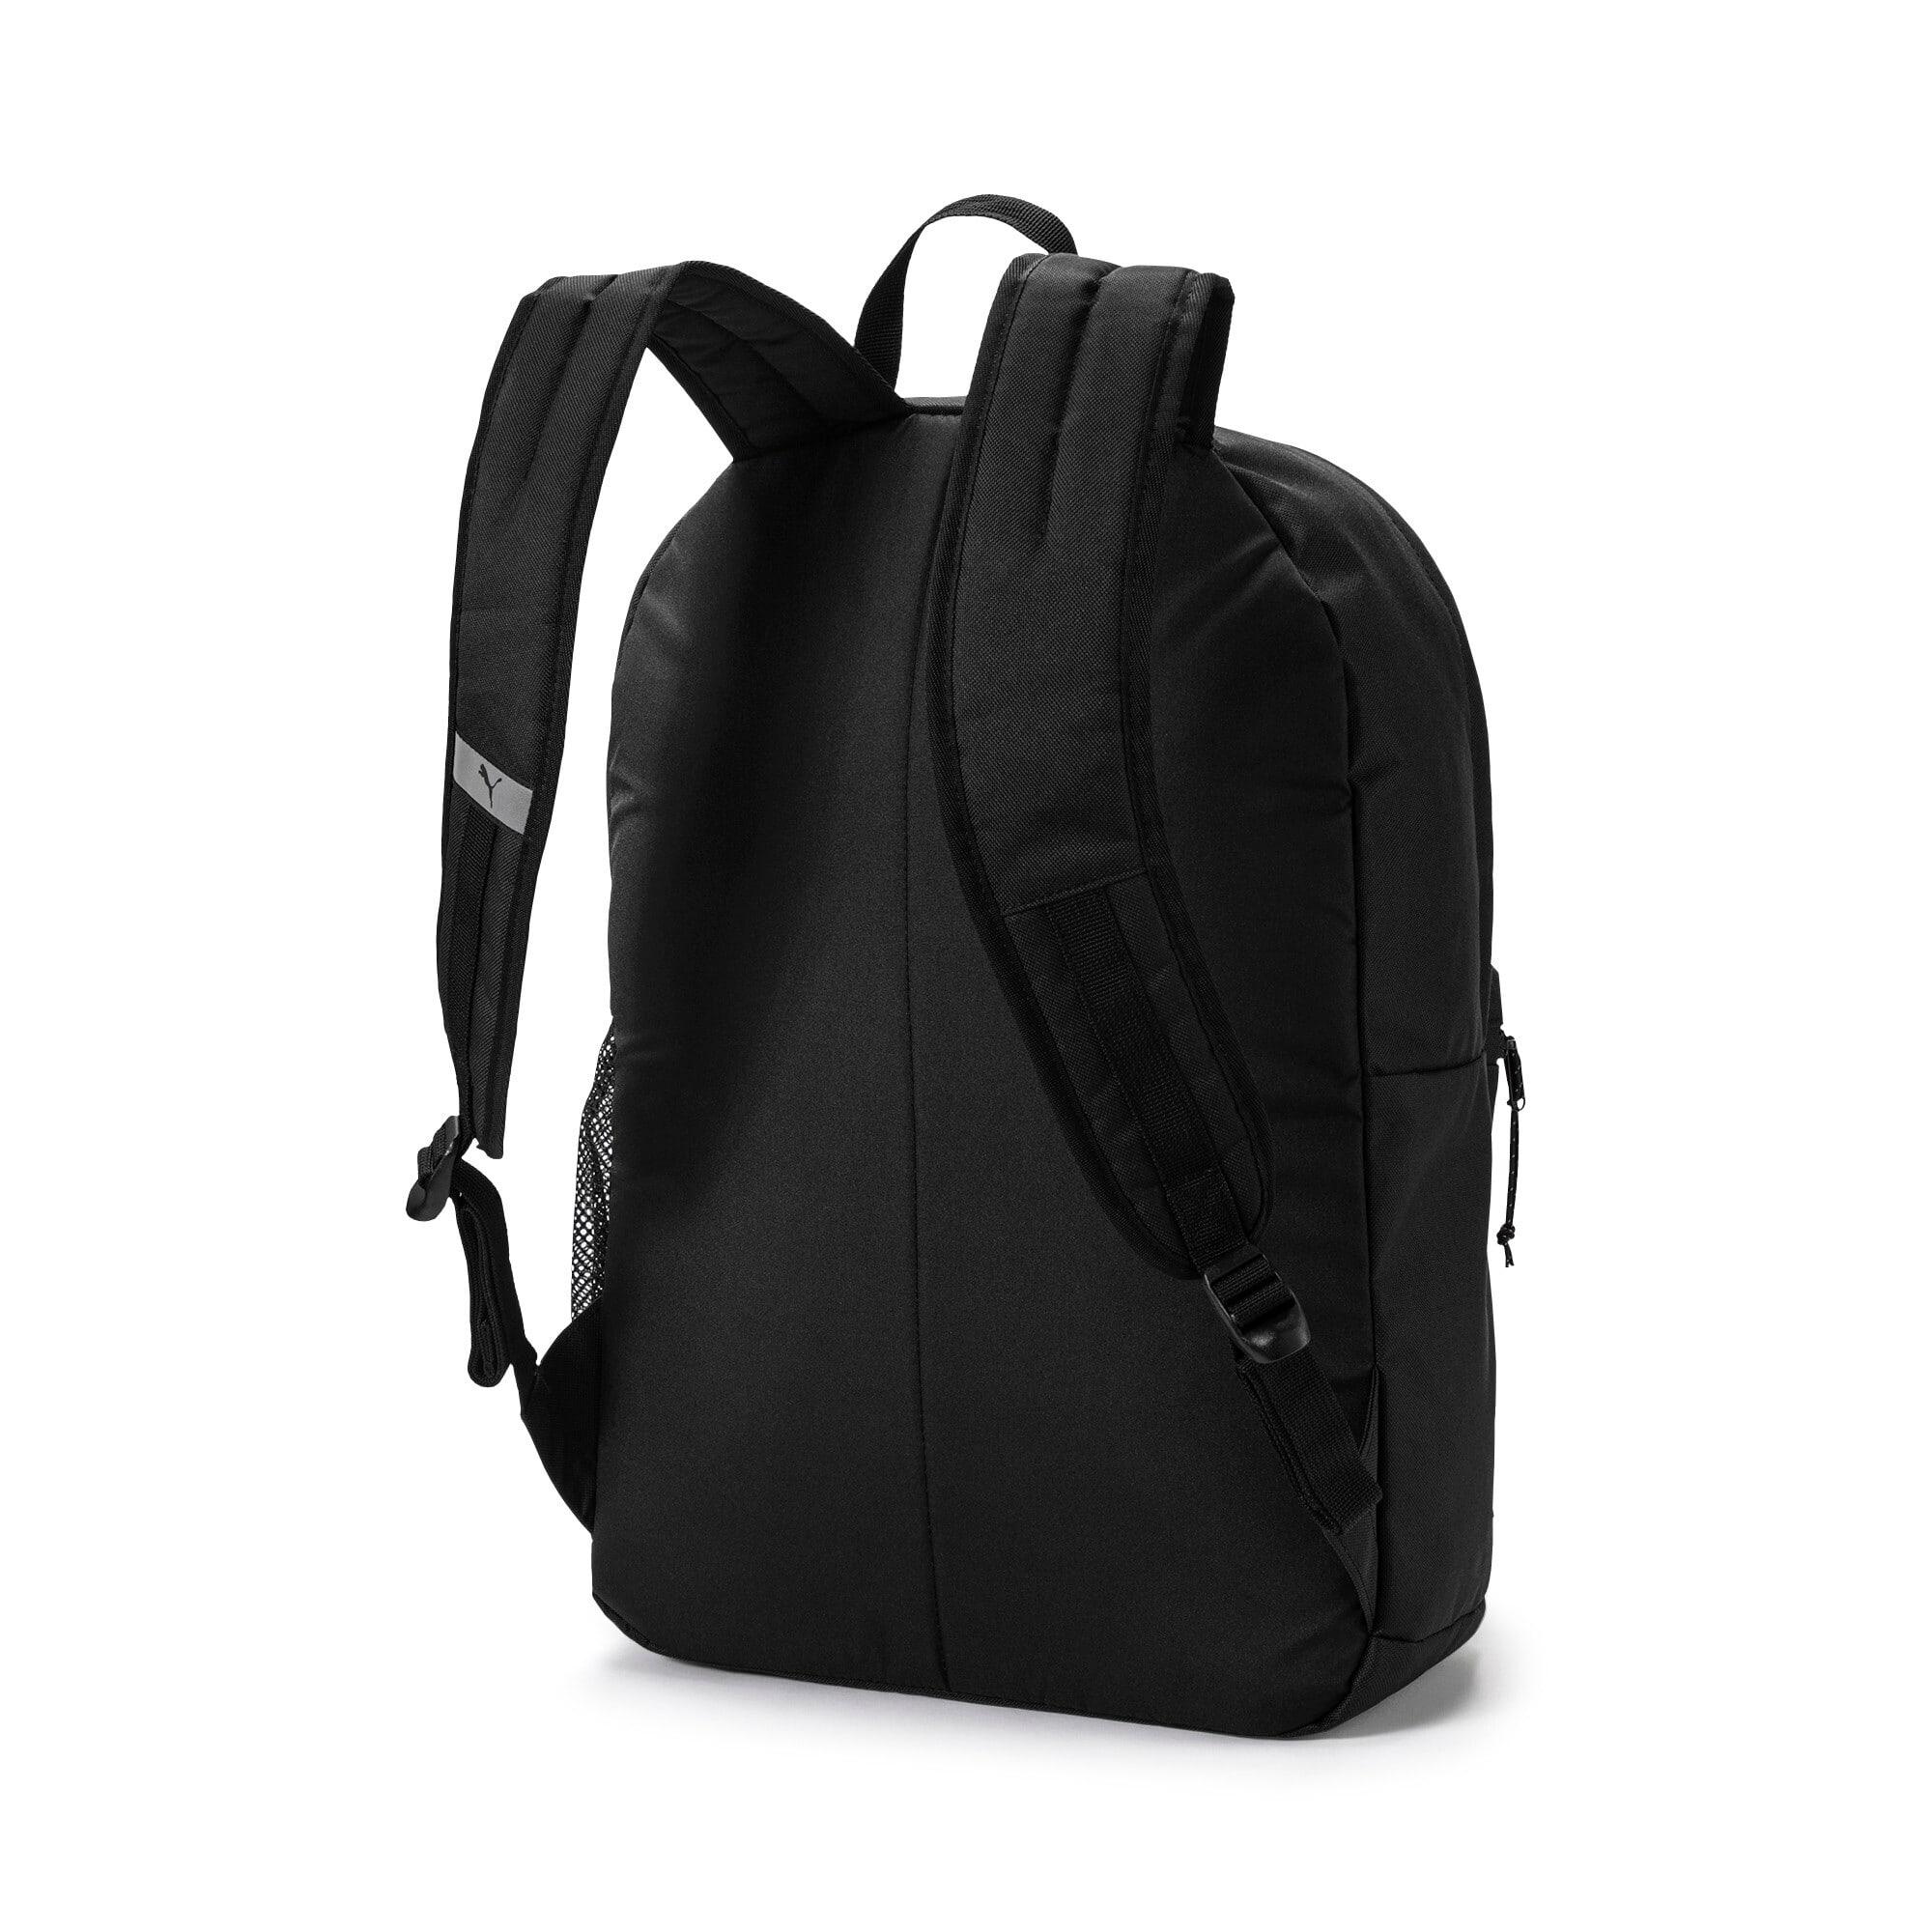 Thumbnail 2 of PUMA Academy Backpack, Puma Black, medium